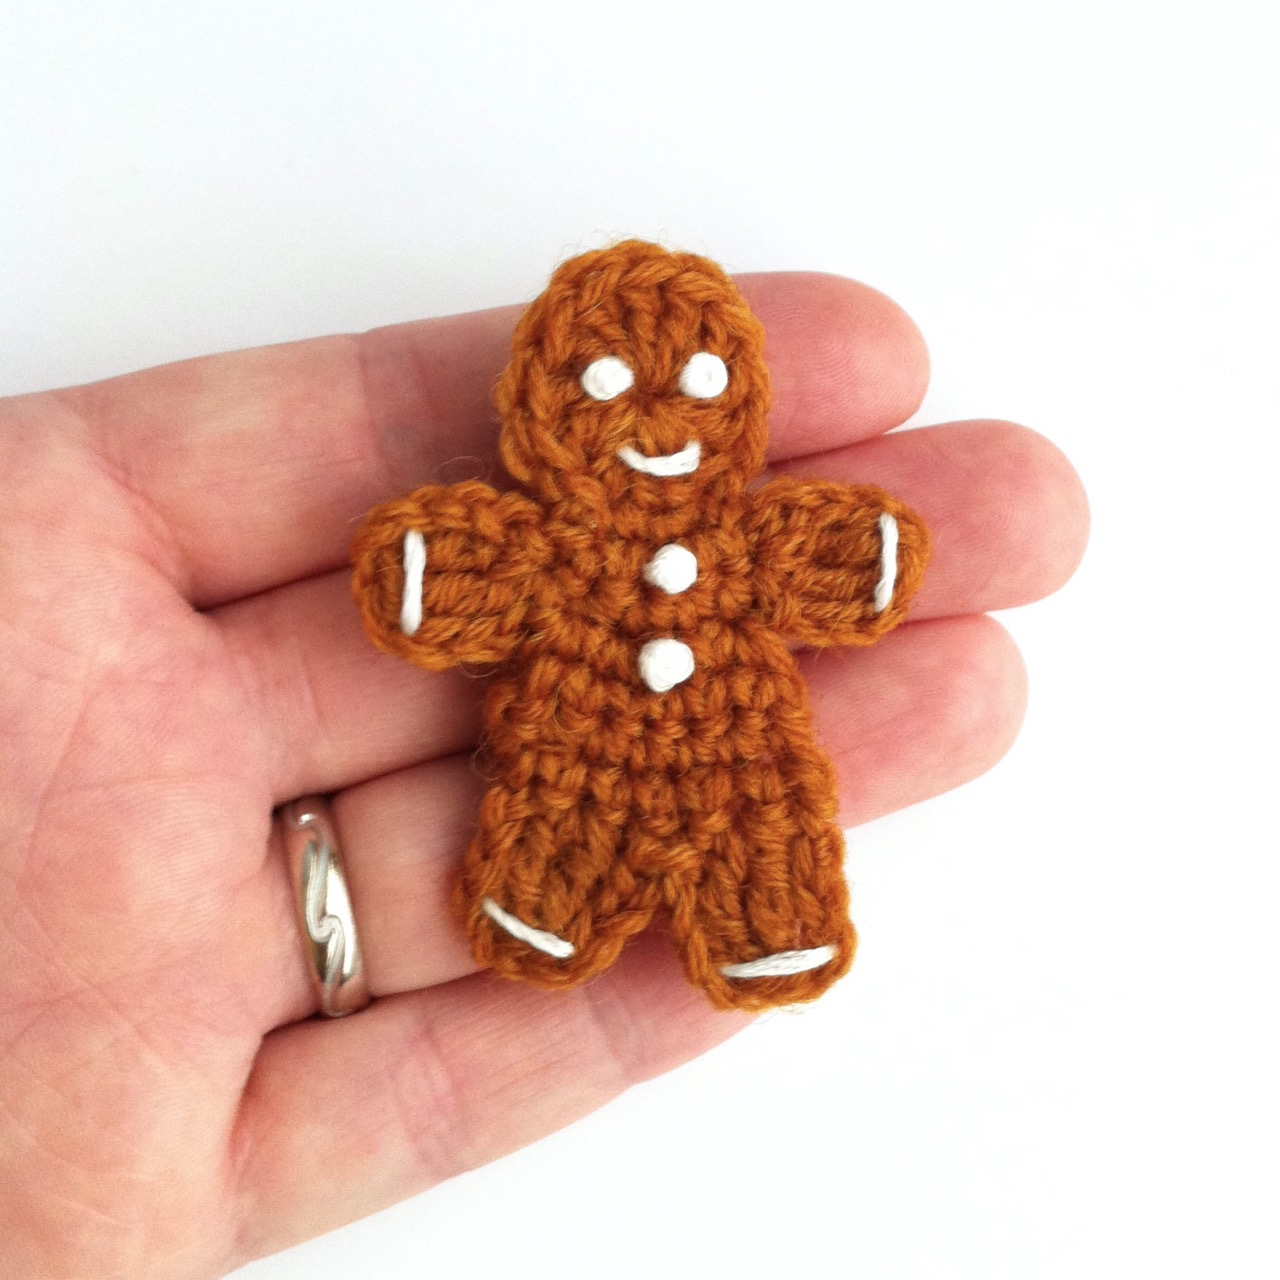 Crocheted Gingerbread Brooch